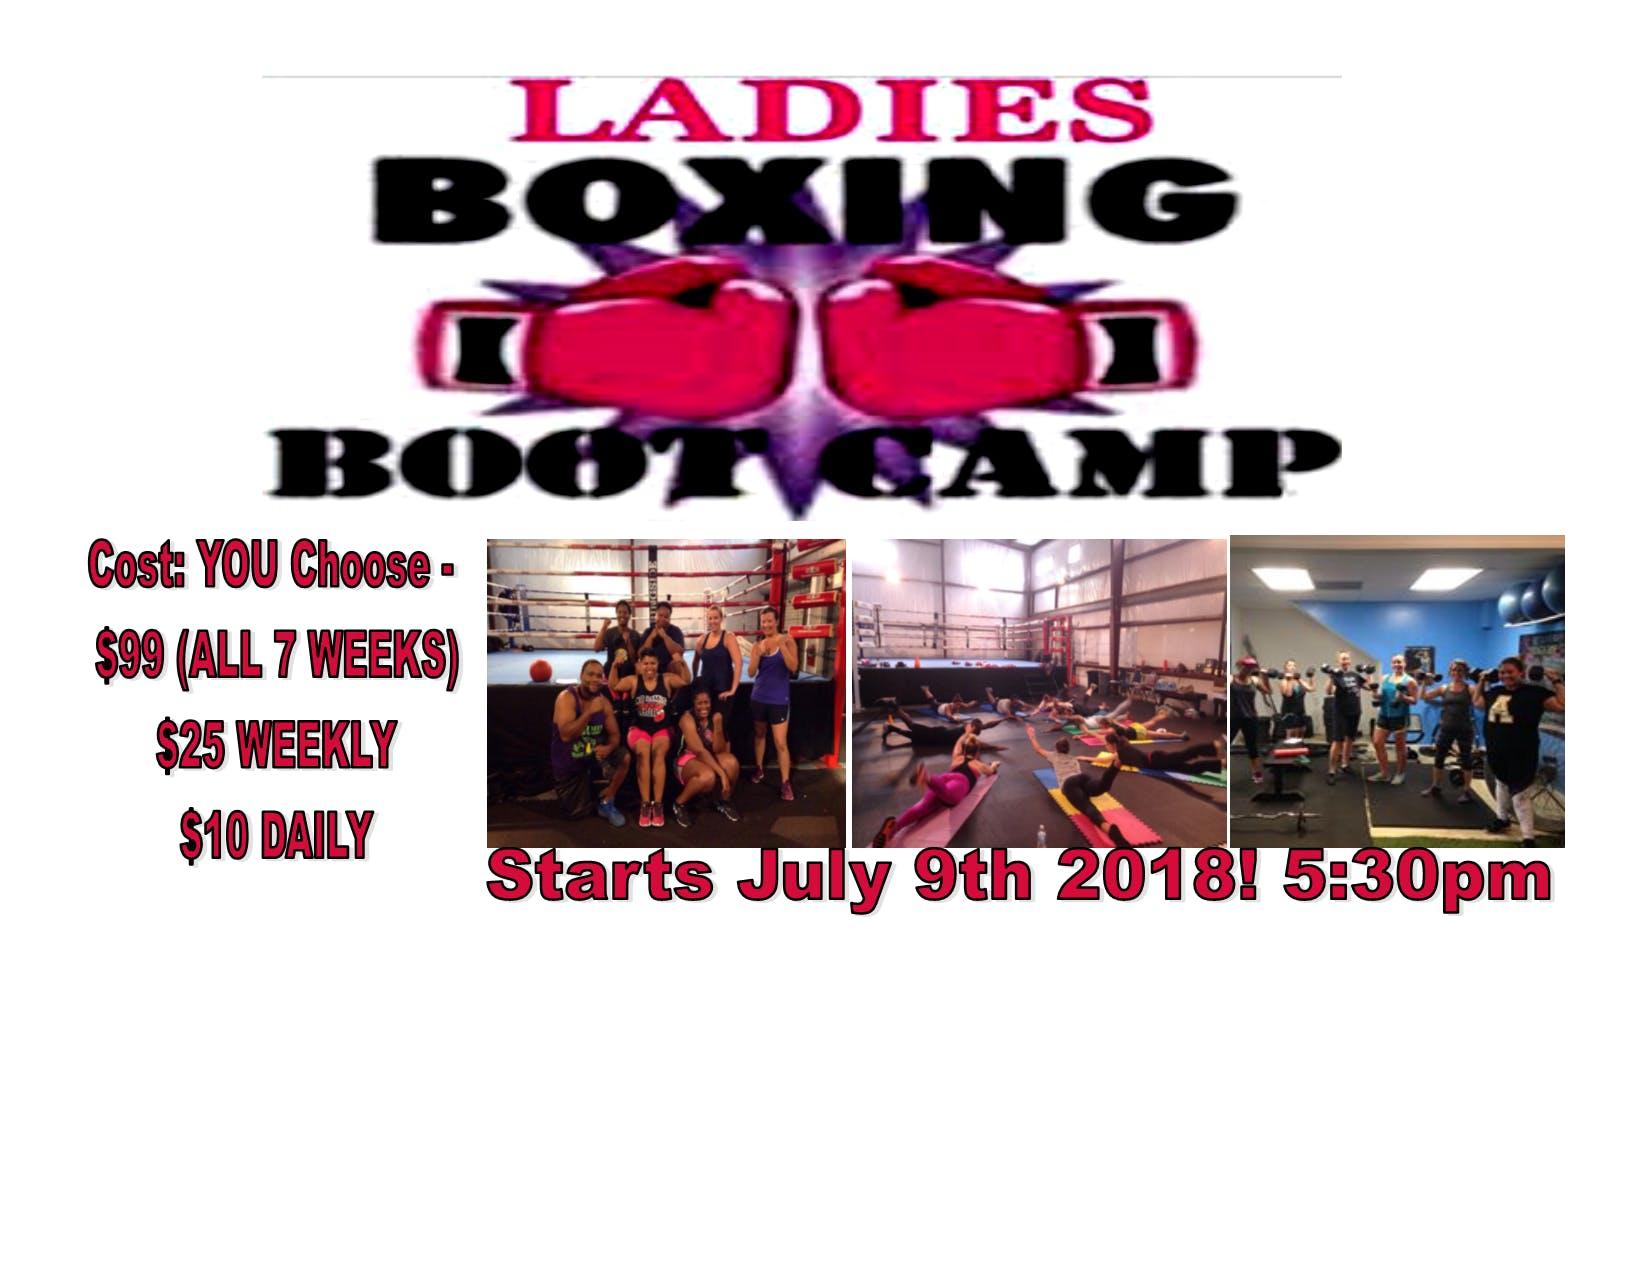 Ladies Boxing Boot Camp